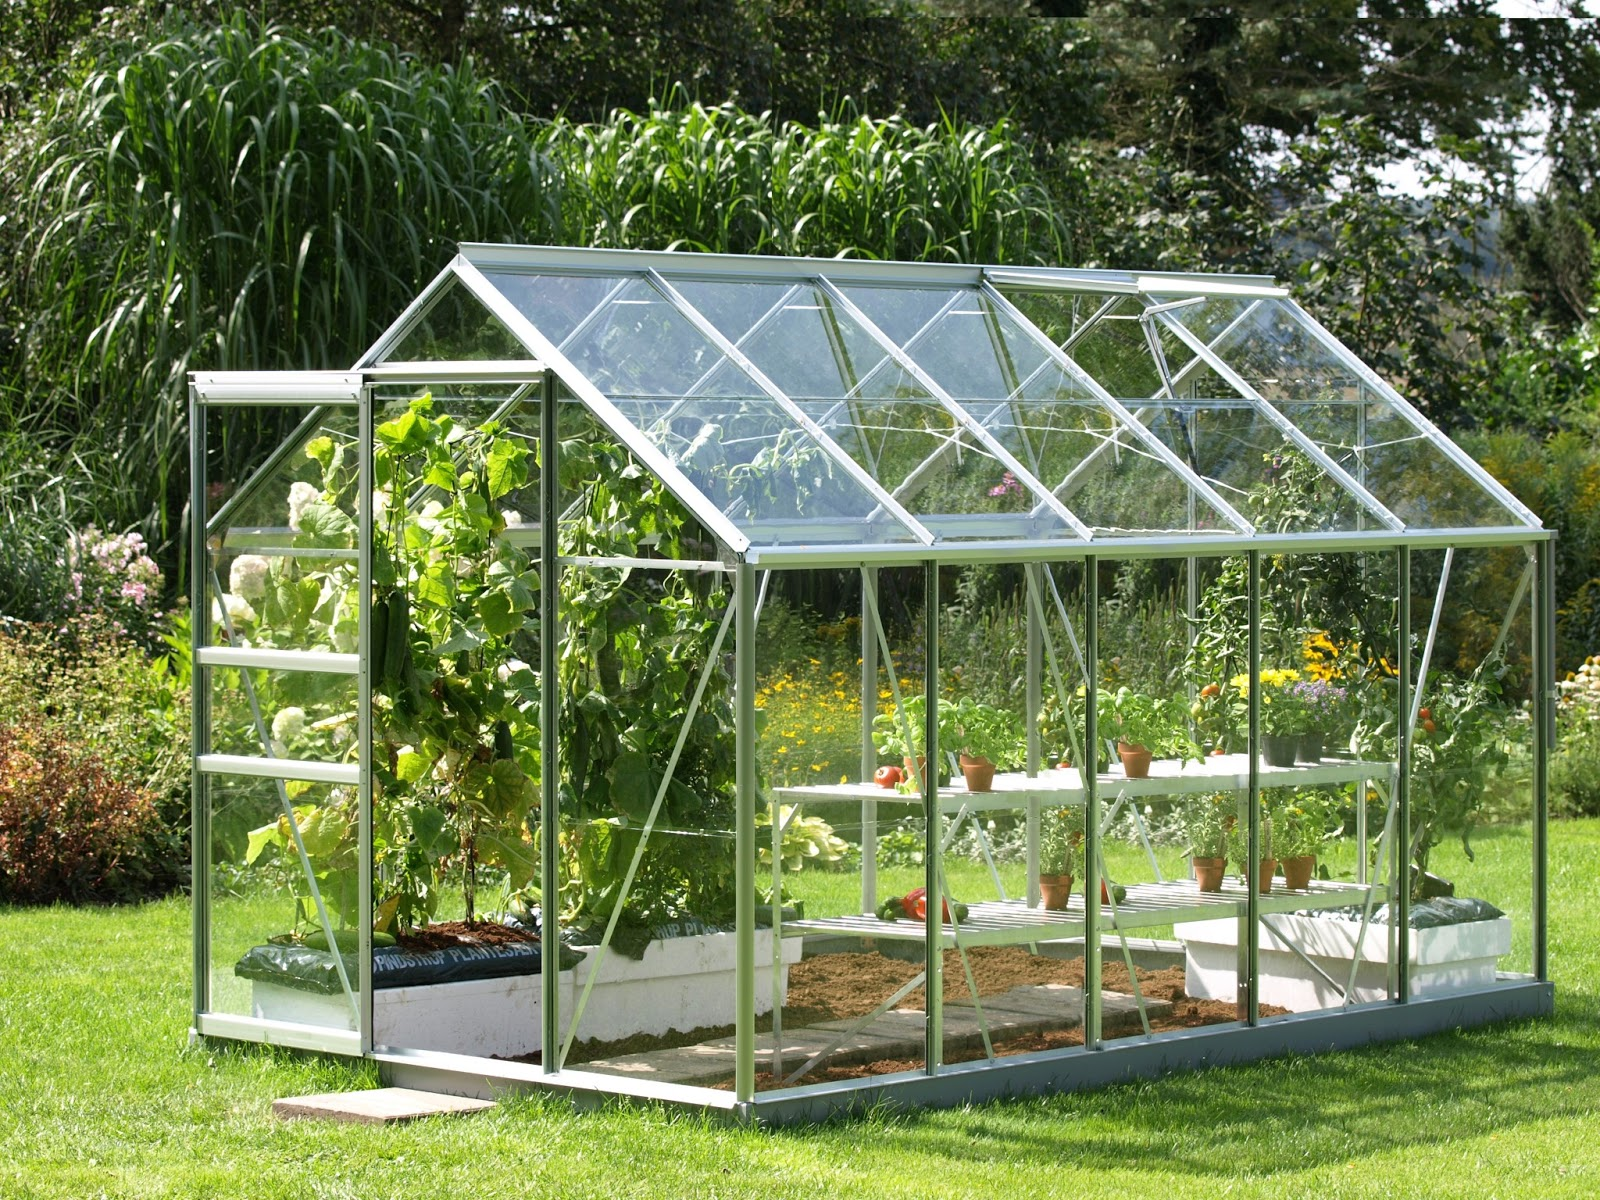 Agricultura protegida en m xico - Invernadero de cristal ...